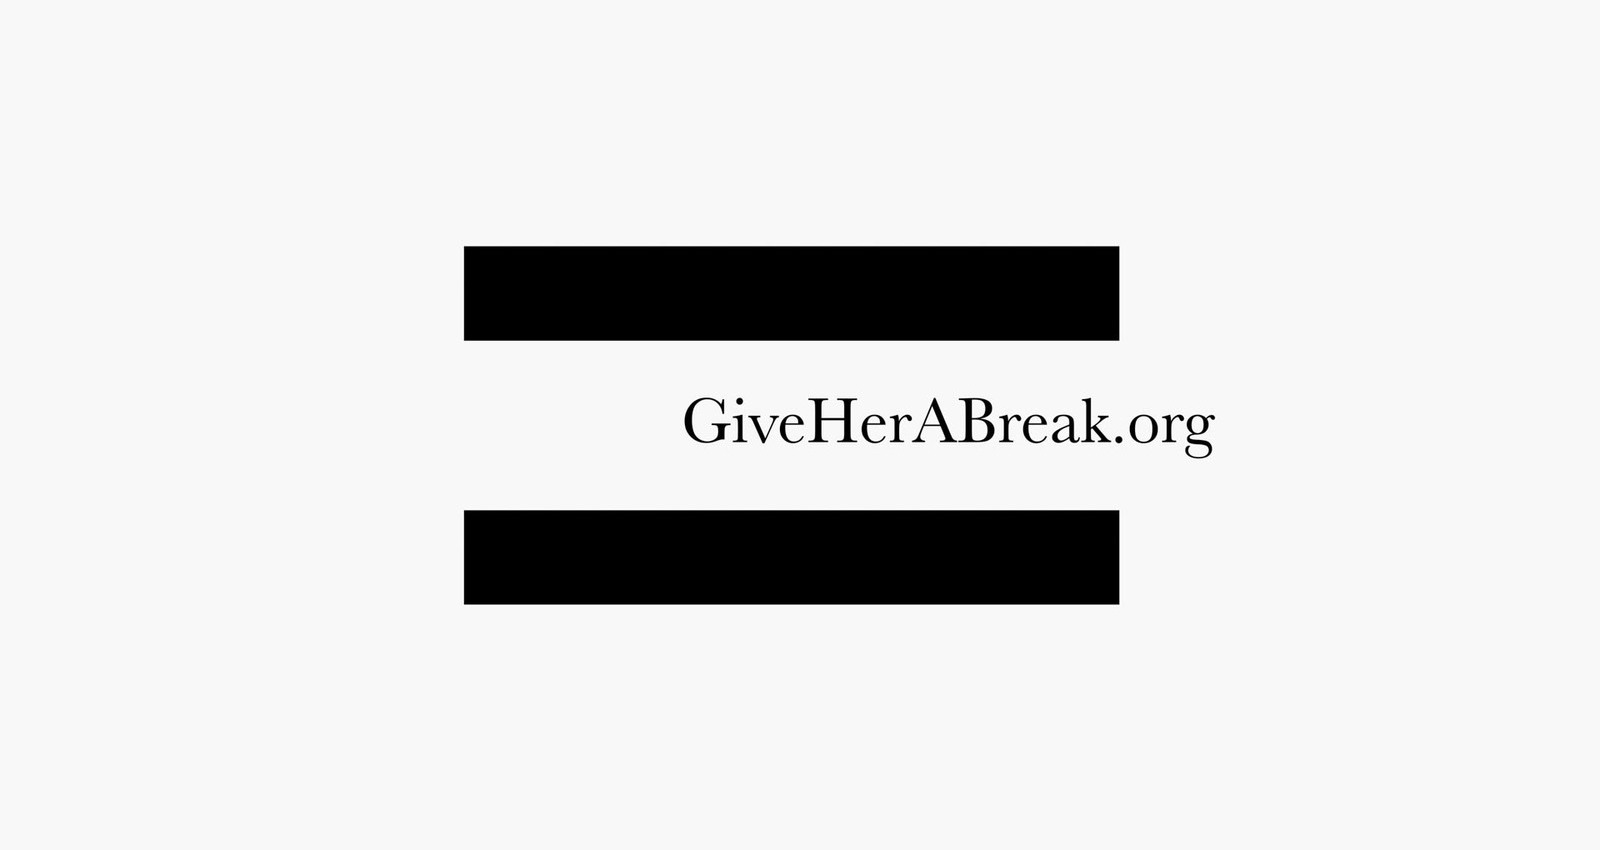 GiveHerABreak - Break The Oscars